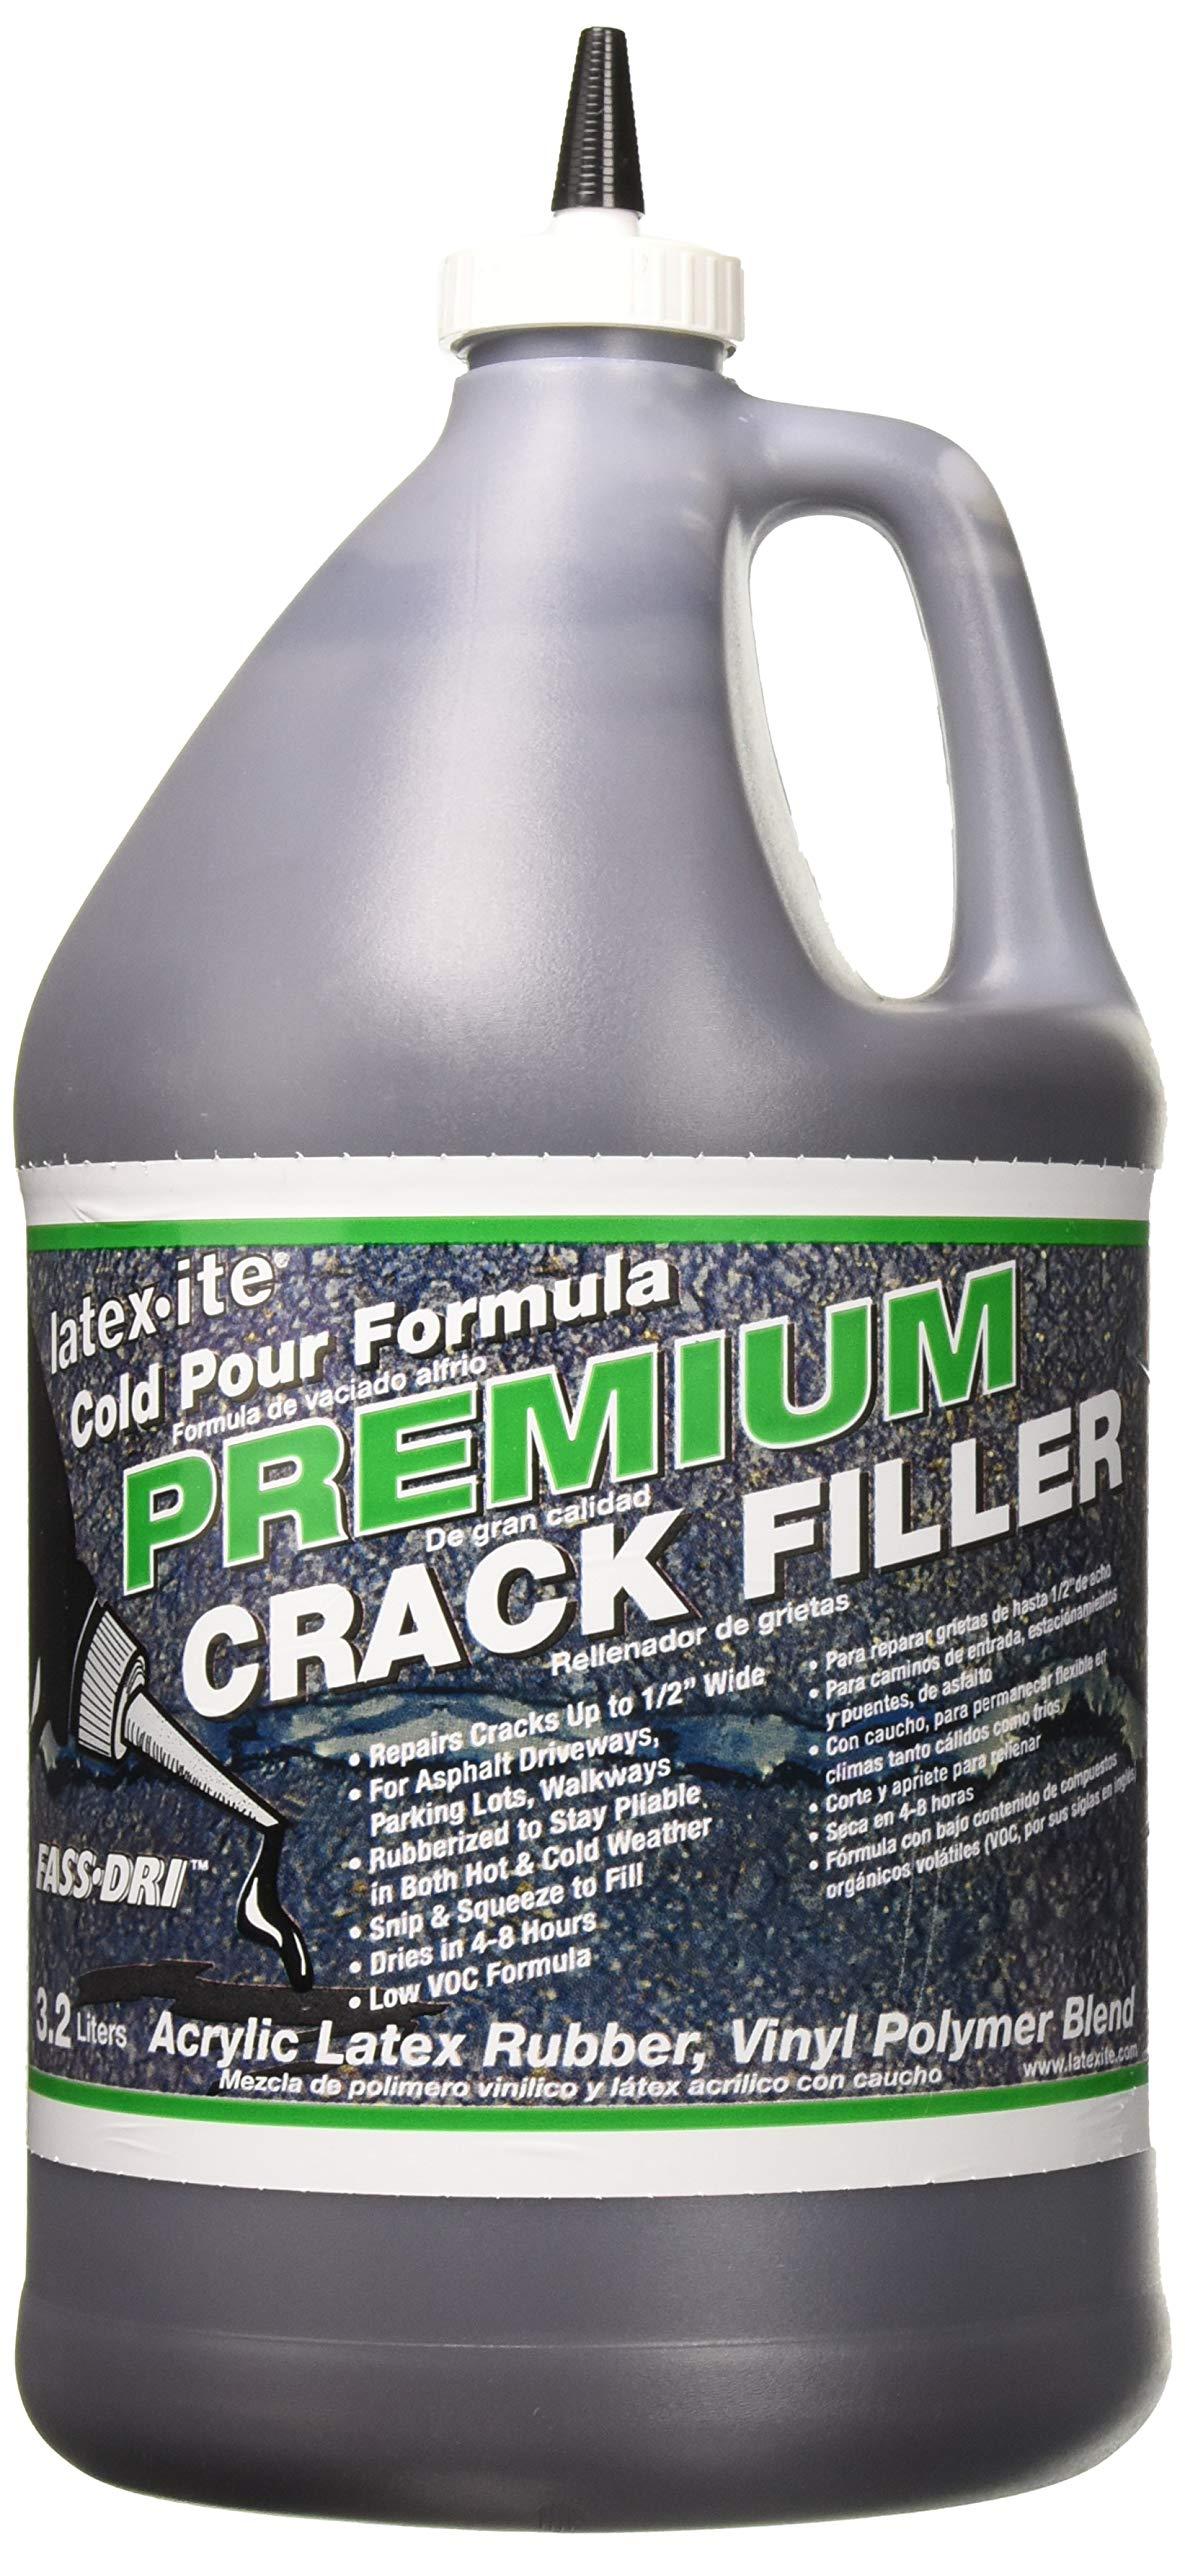 DALTON ENTERPRISES 31623 Latex-Ite Premium Crack Filler, 1 Gal